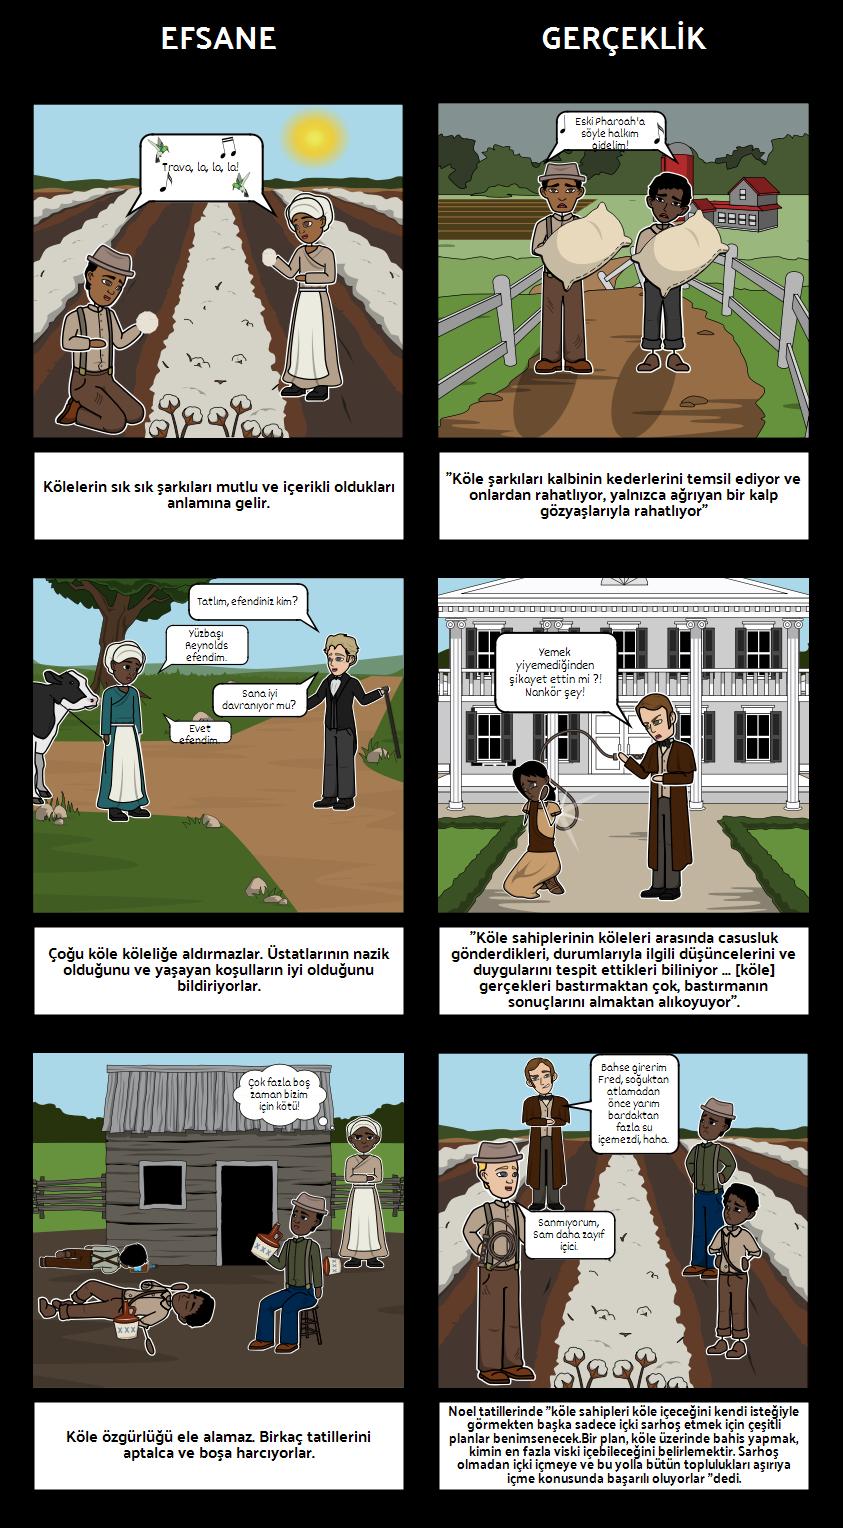 Frederick Douglass Mythbusters'ın Yaşam Öyküsü